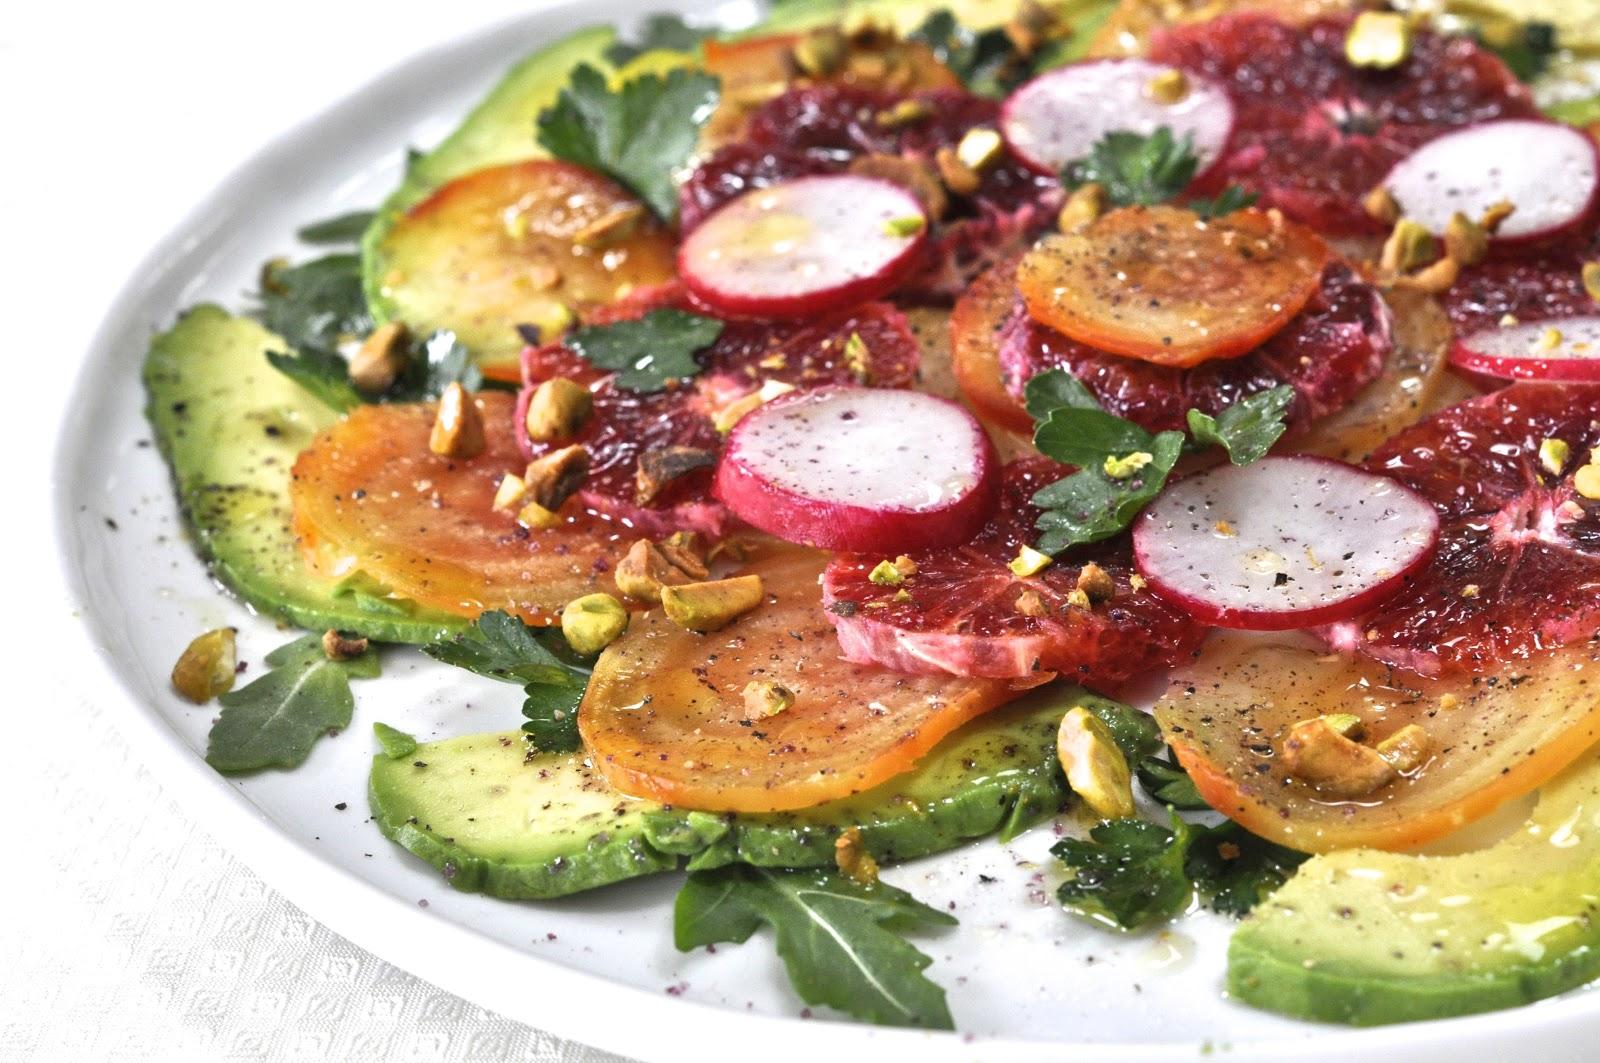 Ciao Chow Linda: Avocado-Beet-Blood Orange Salad